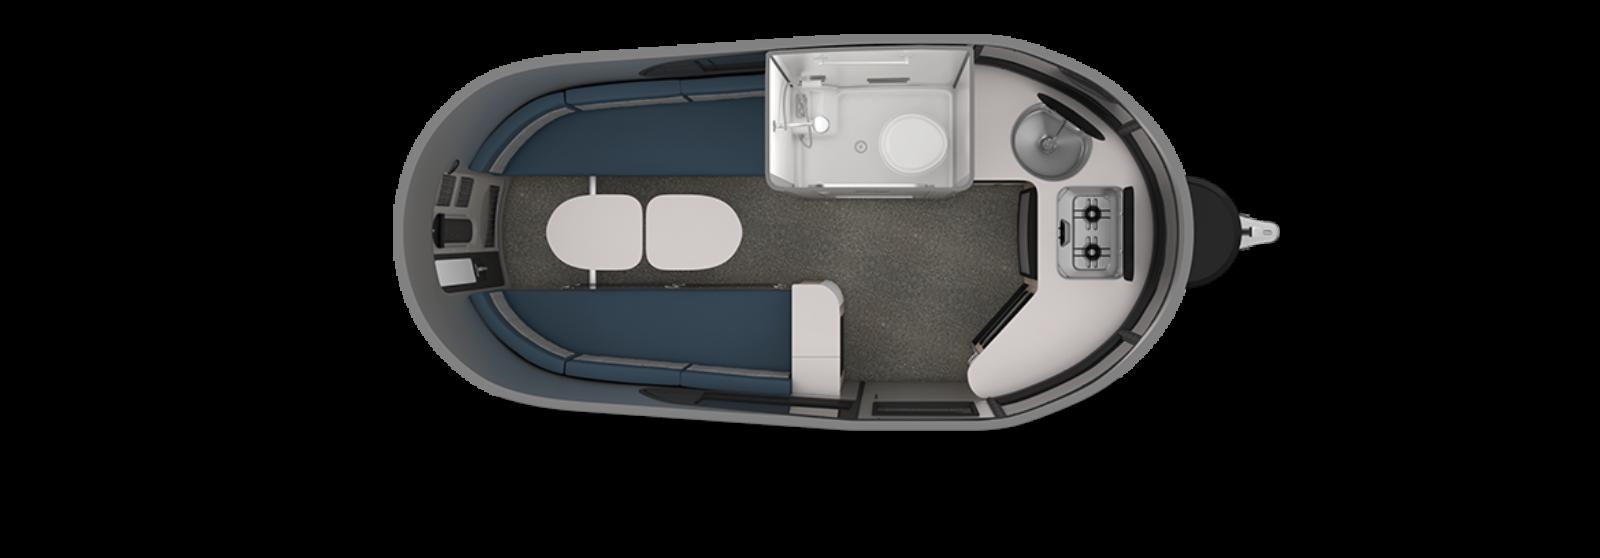 Airstream-Basecamp-Glacier-Lake-Floor-Plan